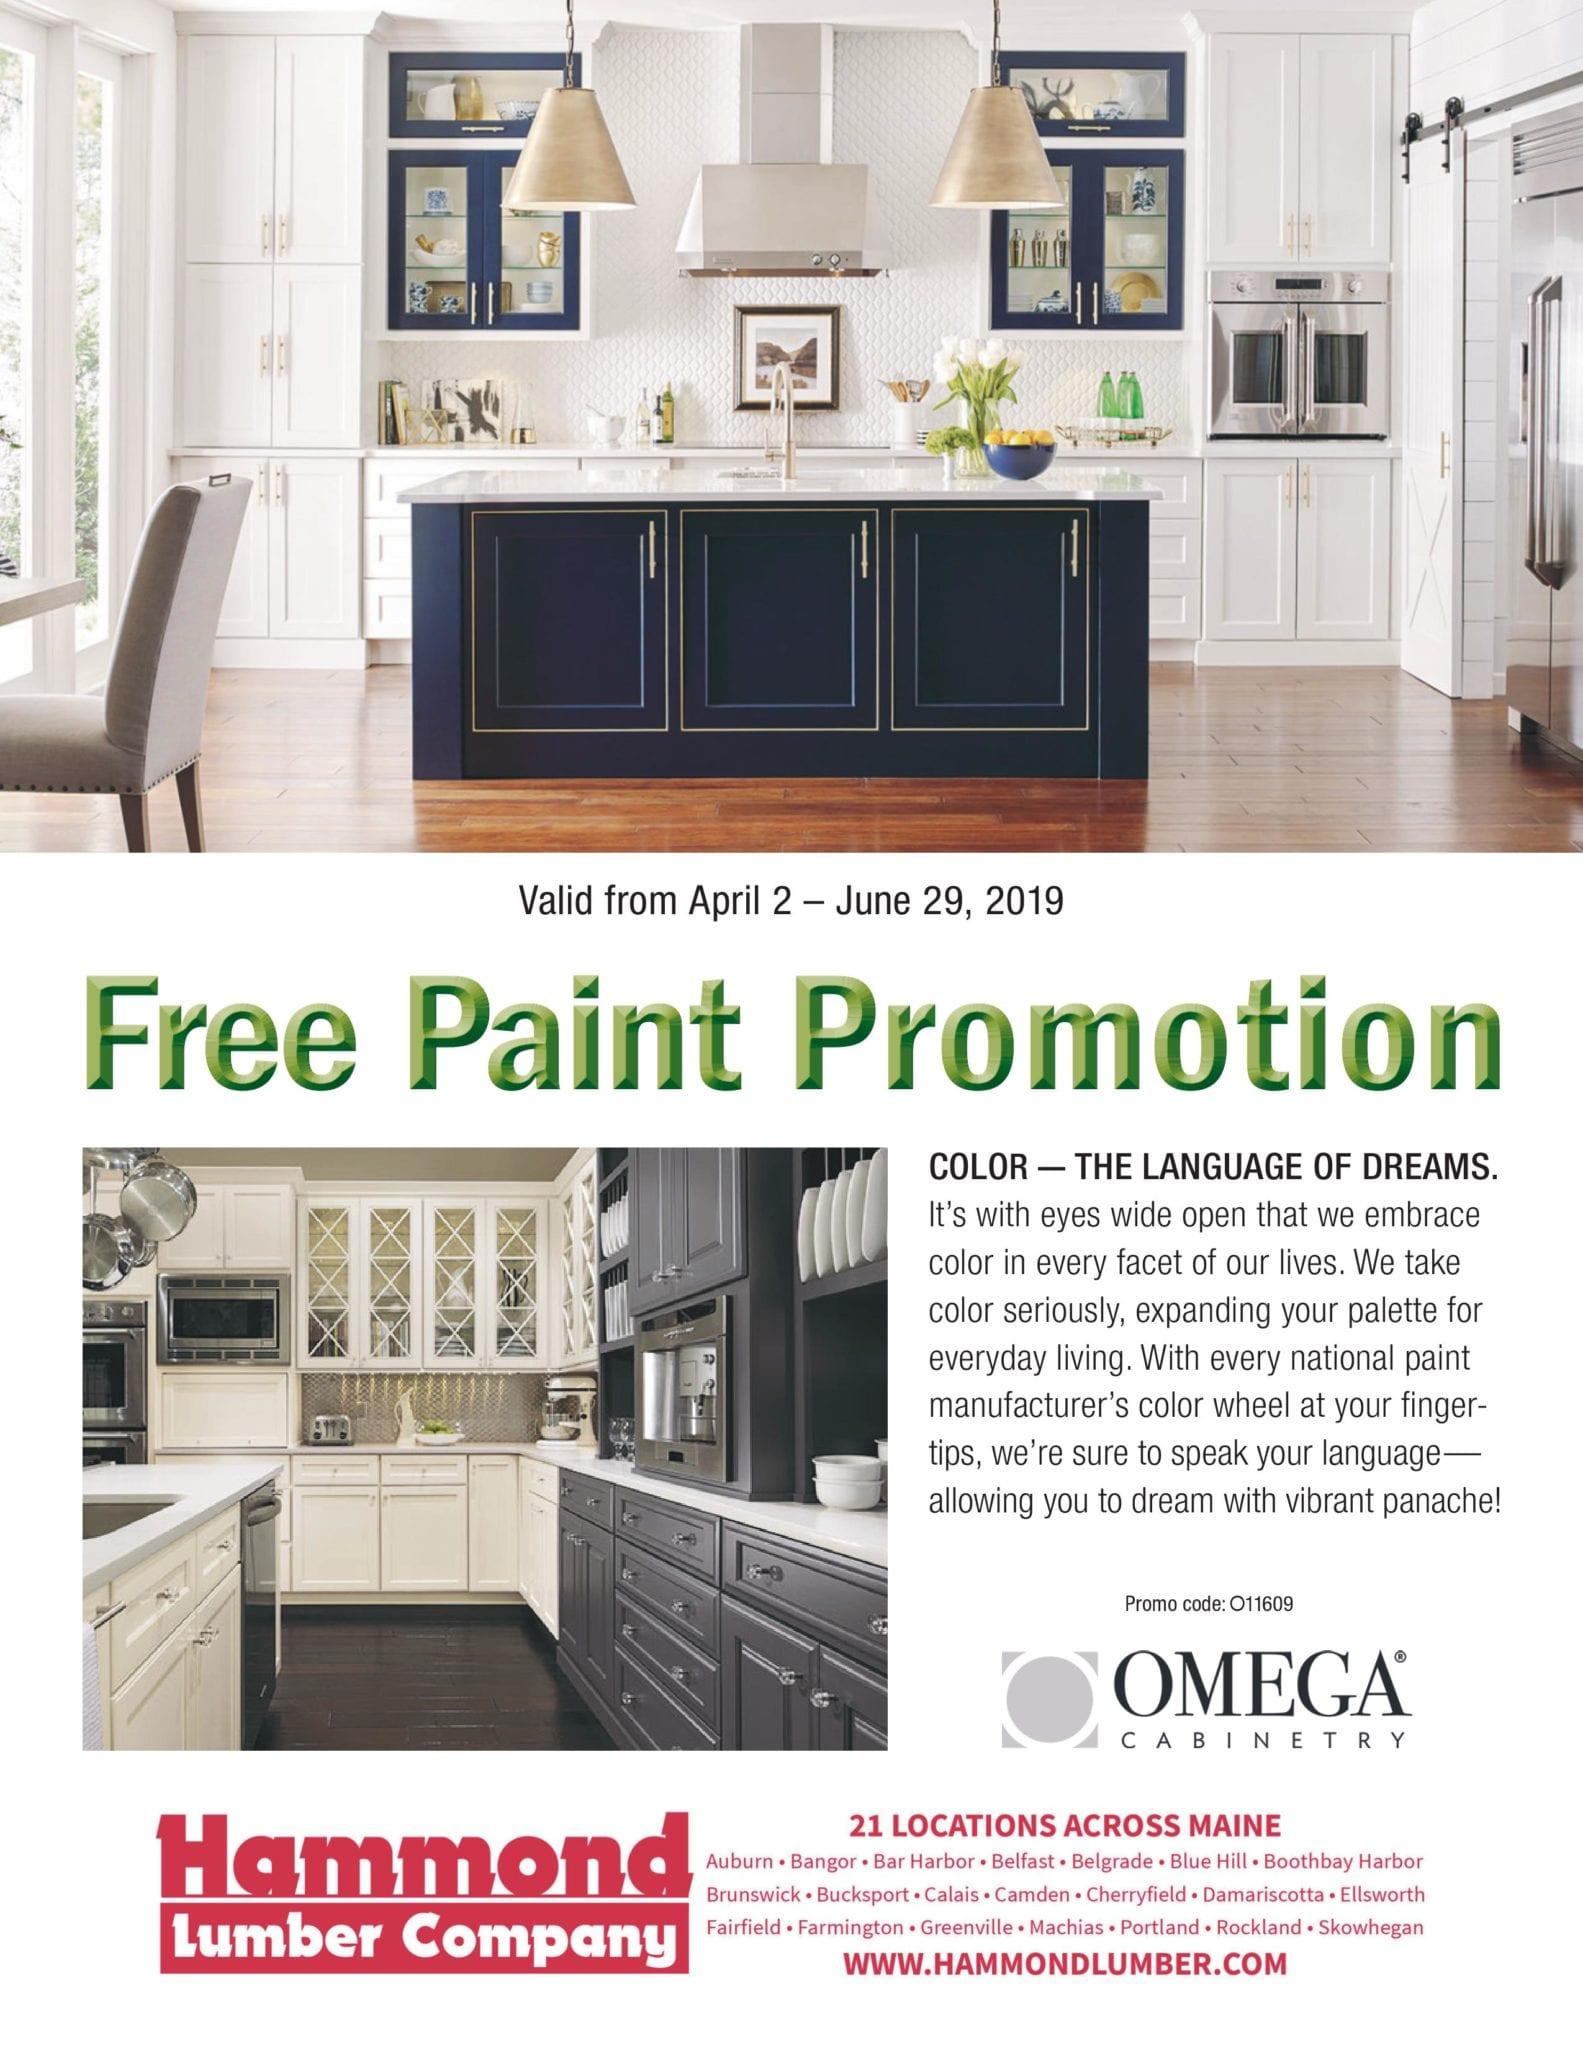 Omega Free Paint Promotion At Hammond Lumber Company Hammond